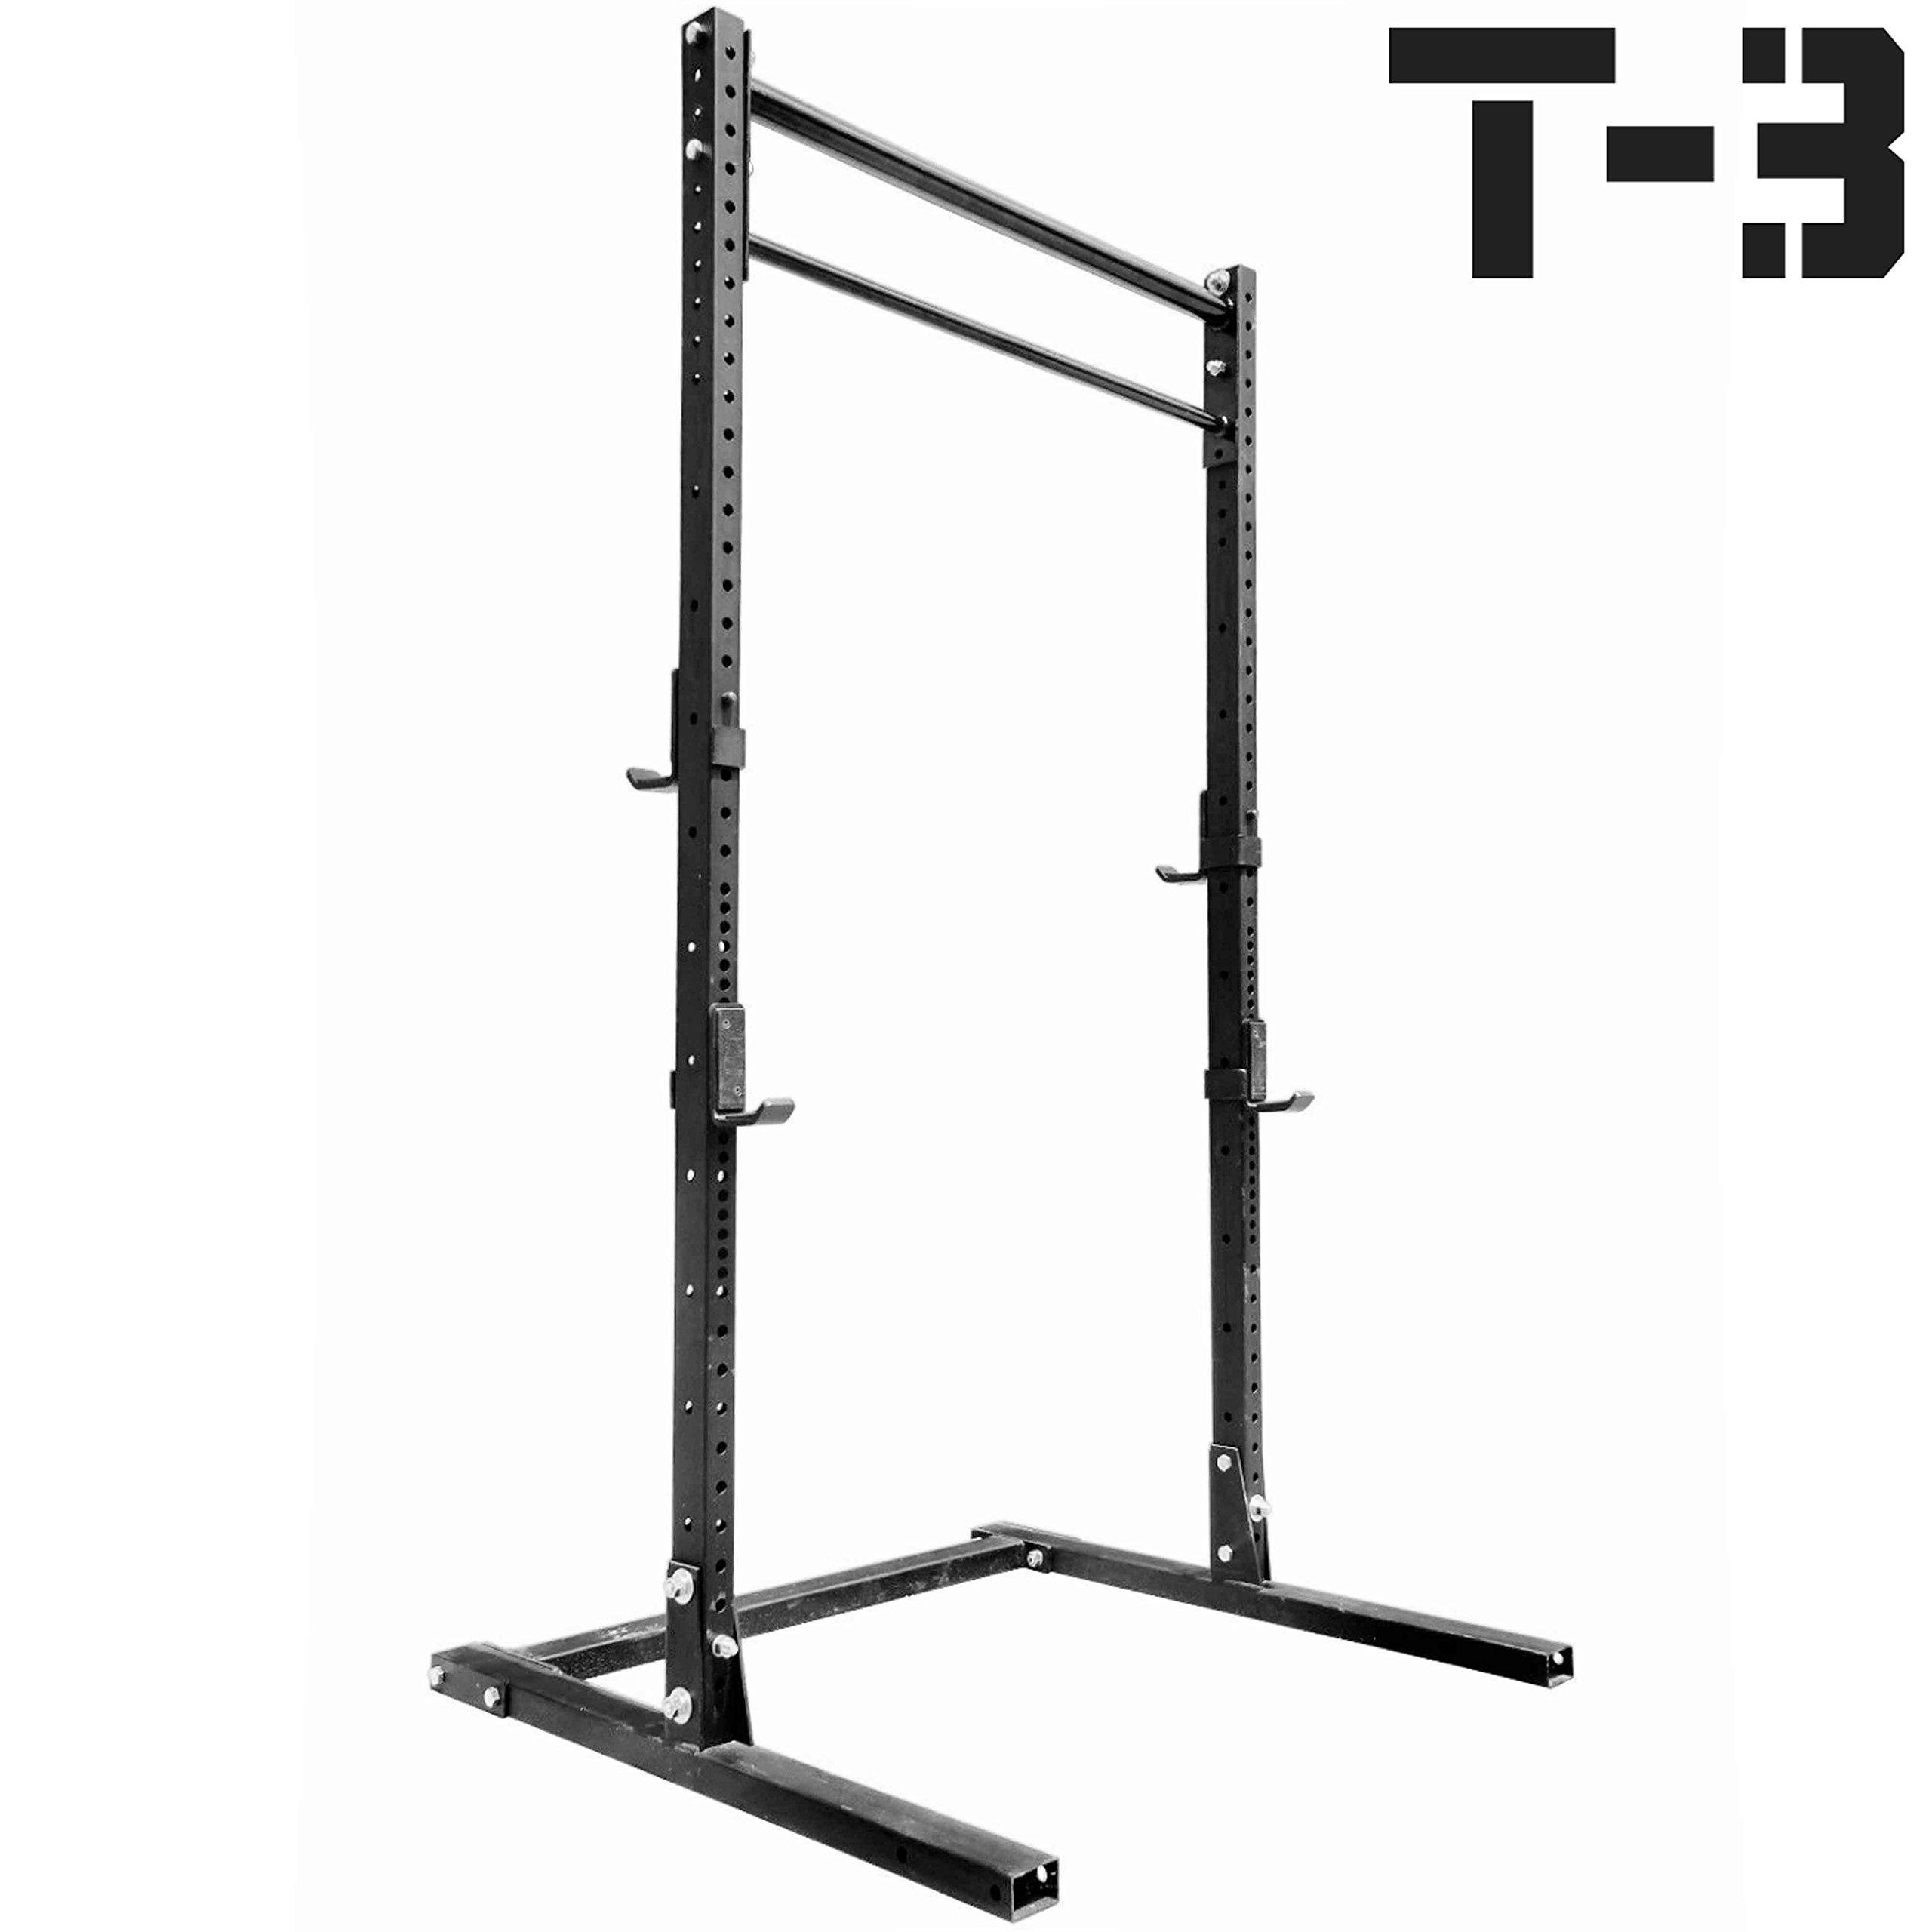 Titan T-3 Squat Rack HD Deadlift Lift Weight Training 2''x3'' 1,000 lb Capacity by Titan Fitness